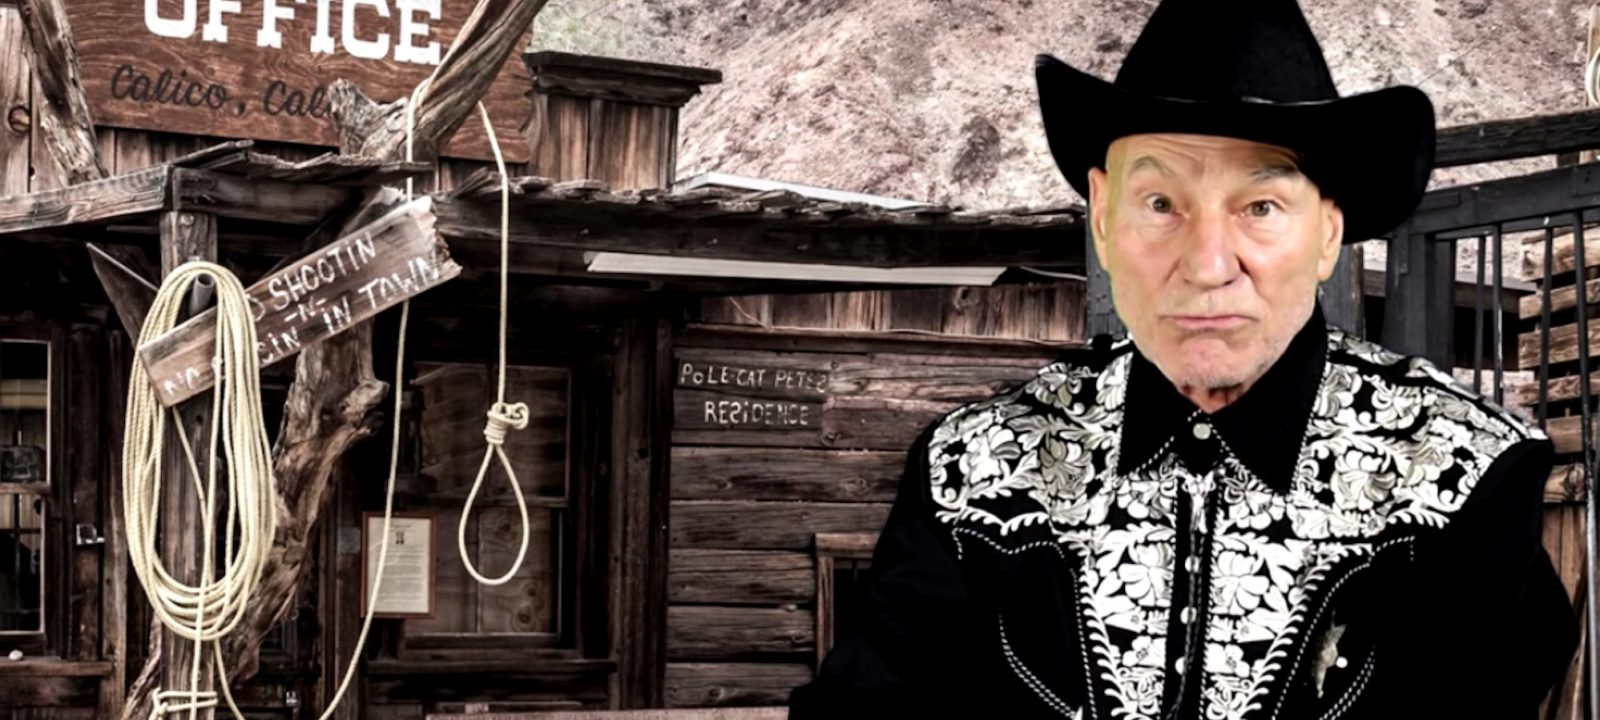 Patrick Stewart Sings Cowboy Classics